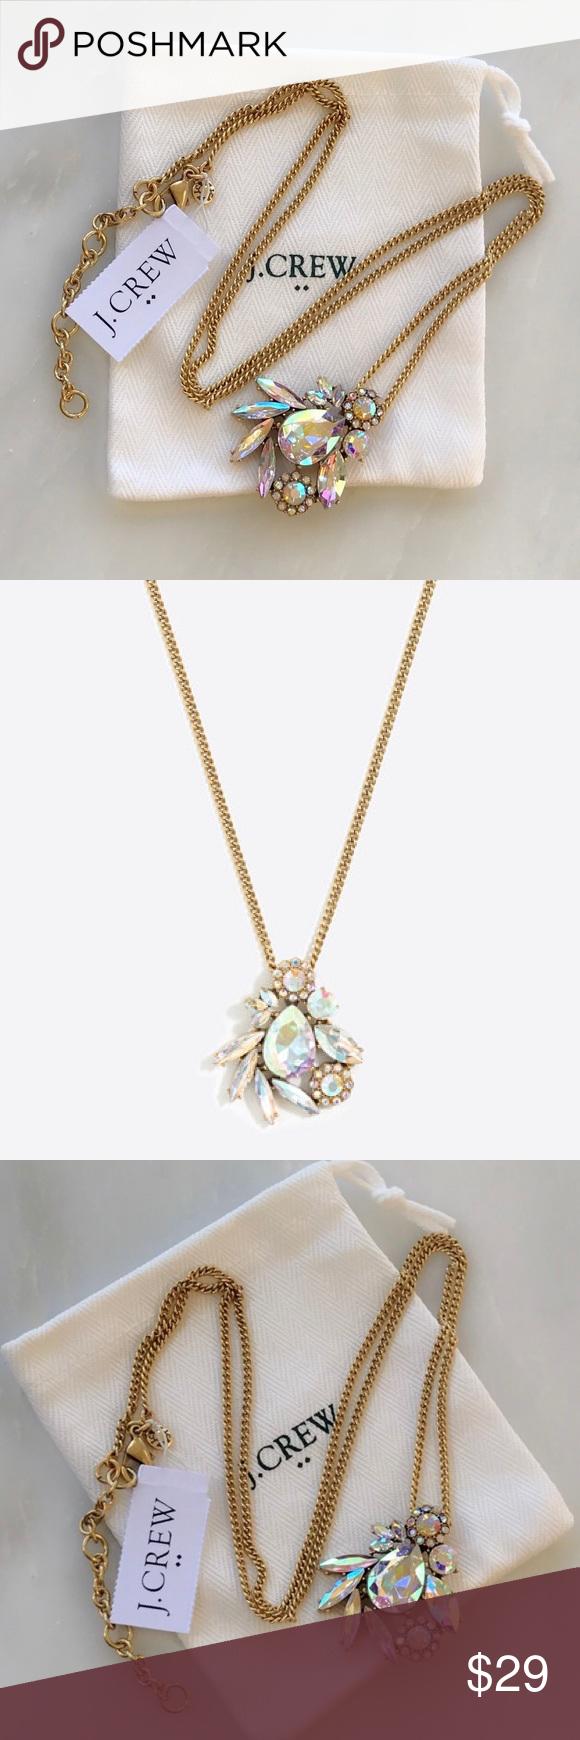 J crew winding iridescent crystal pendant necklace nwt my posh